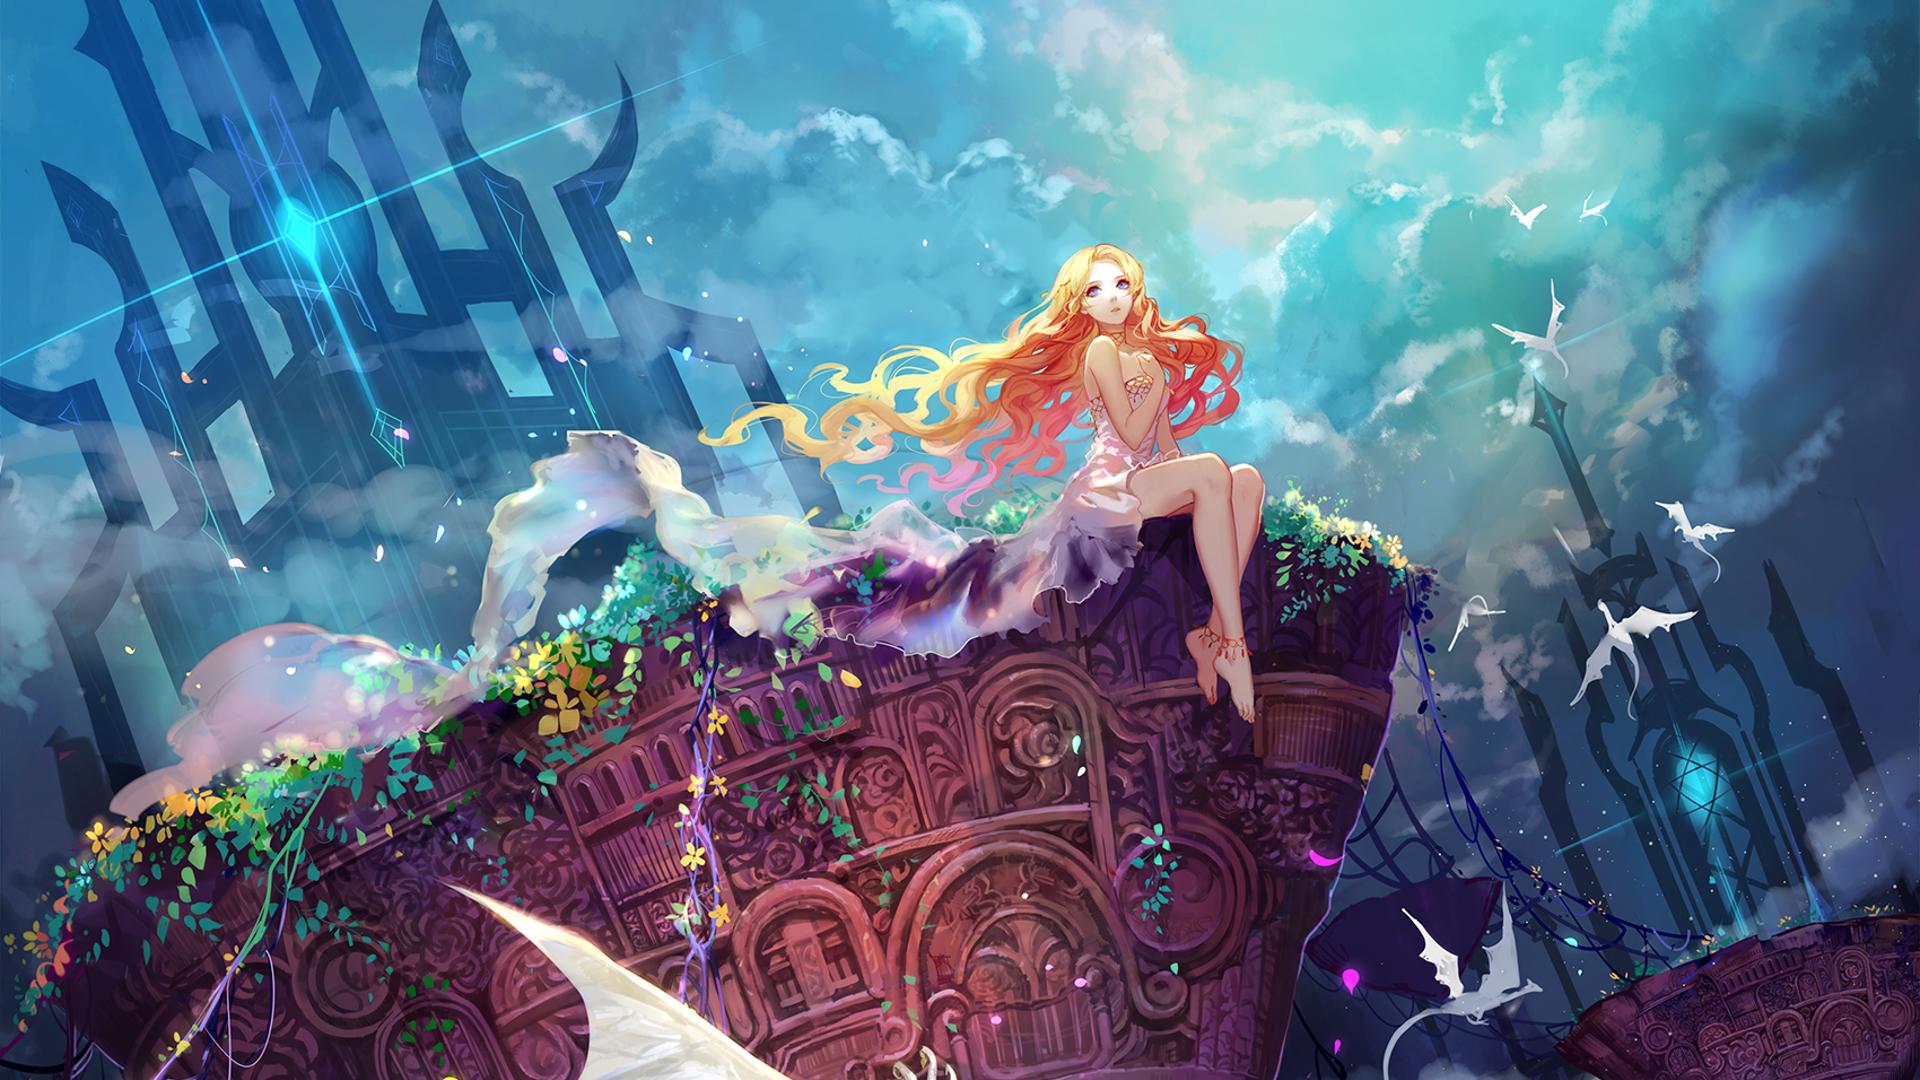 blonde anime anime girls blue eyes sky castle portal magic underwater dragon mythology Carnival screenshot computer